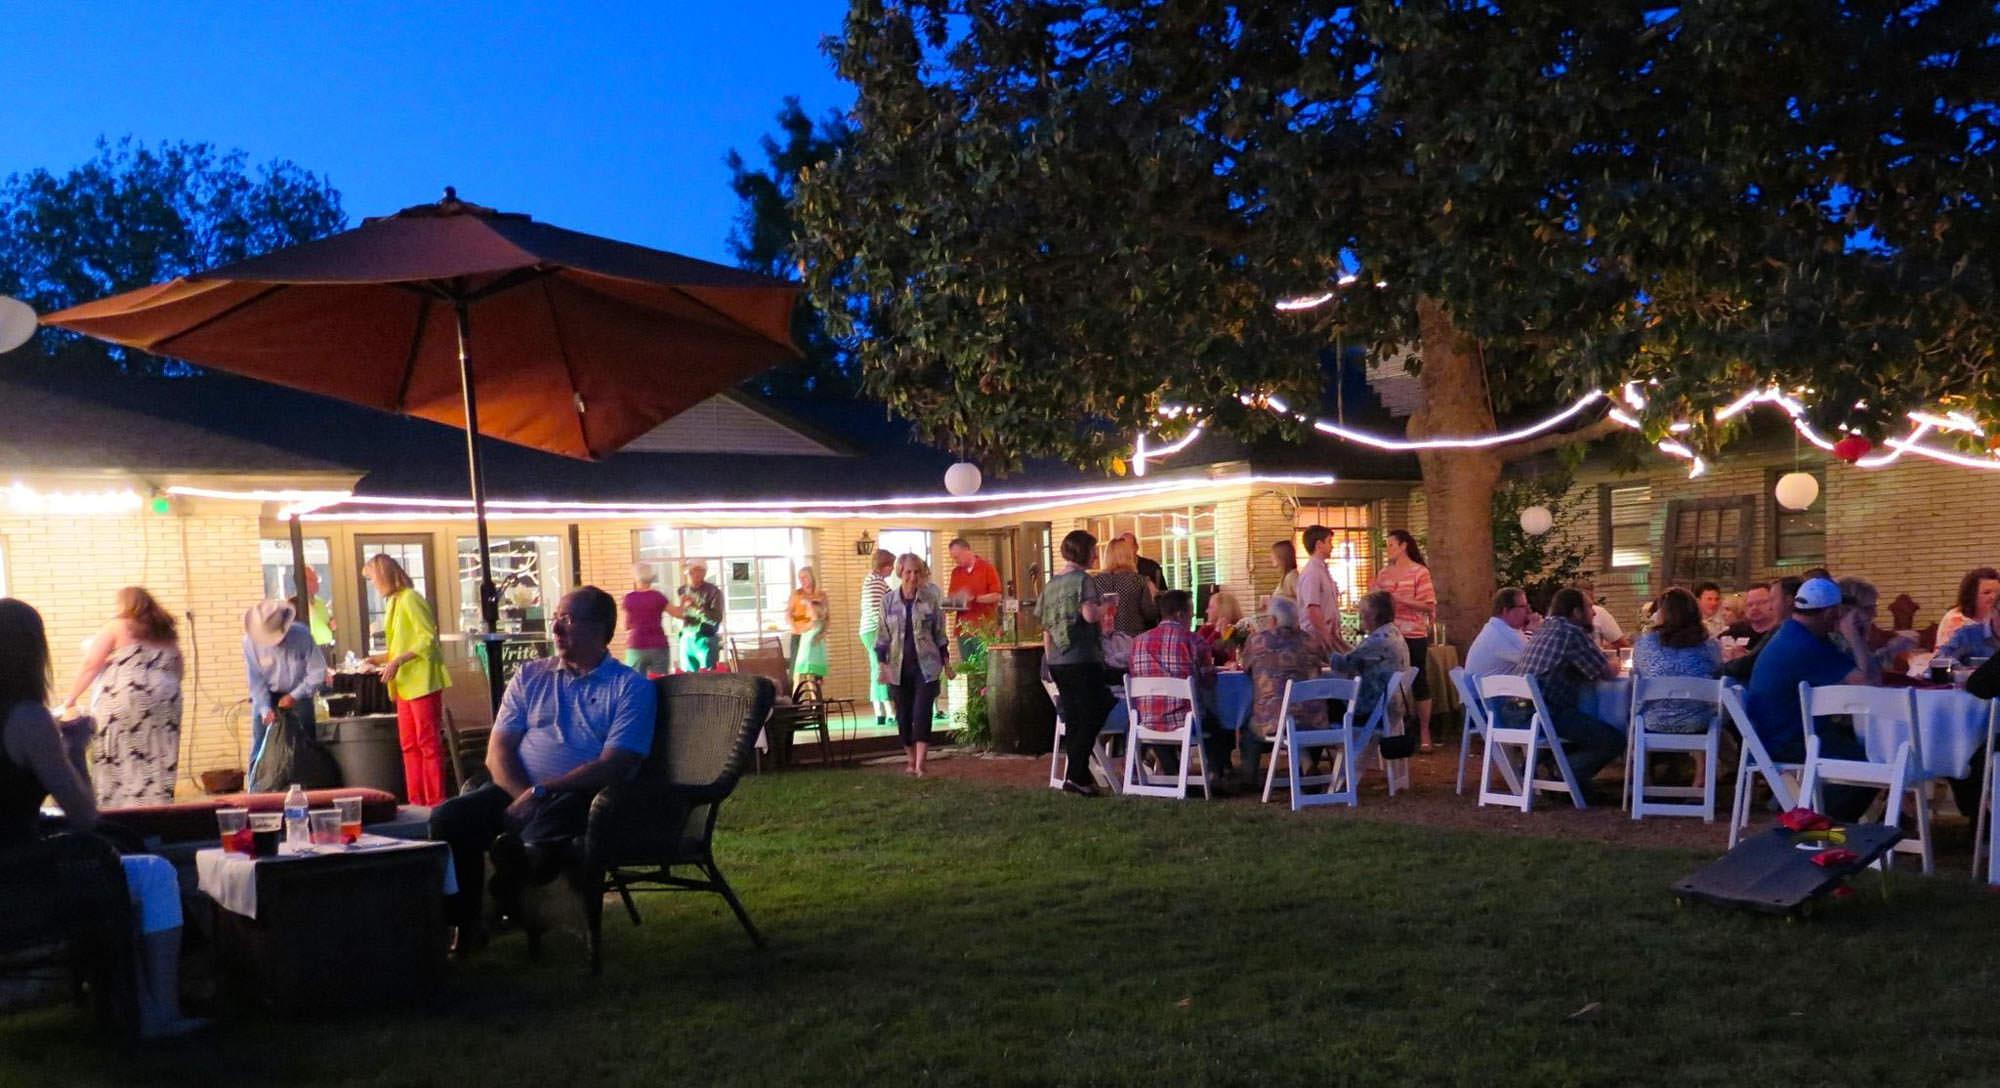 Backyard Party Set Up Ideas  How to Host a Backyard Party & BBQ — Gentleman s Gazette